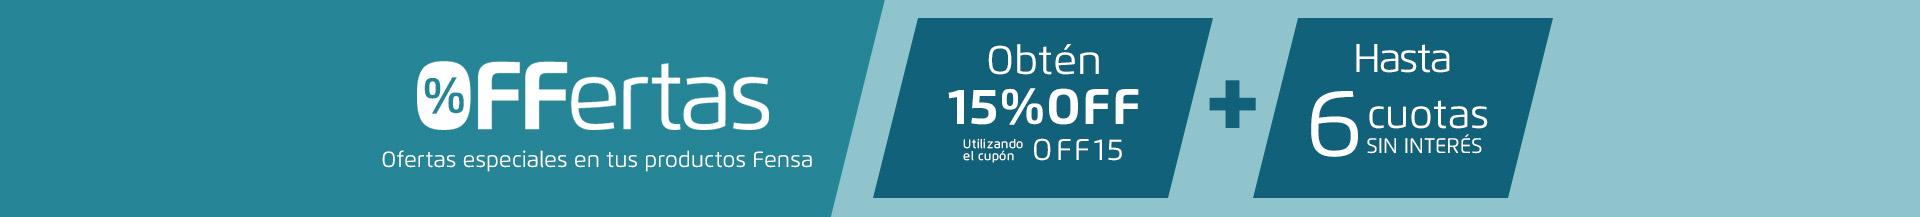 OFFerta 15% - Secadoras